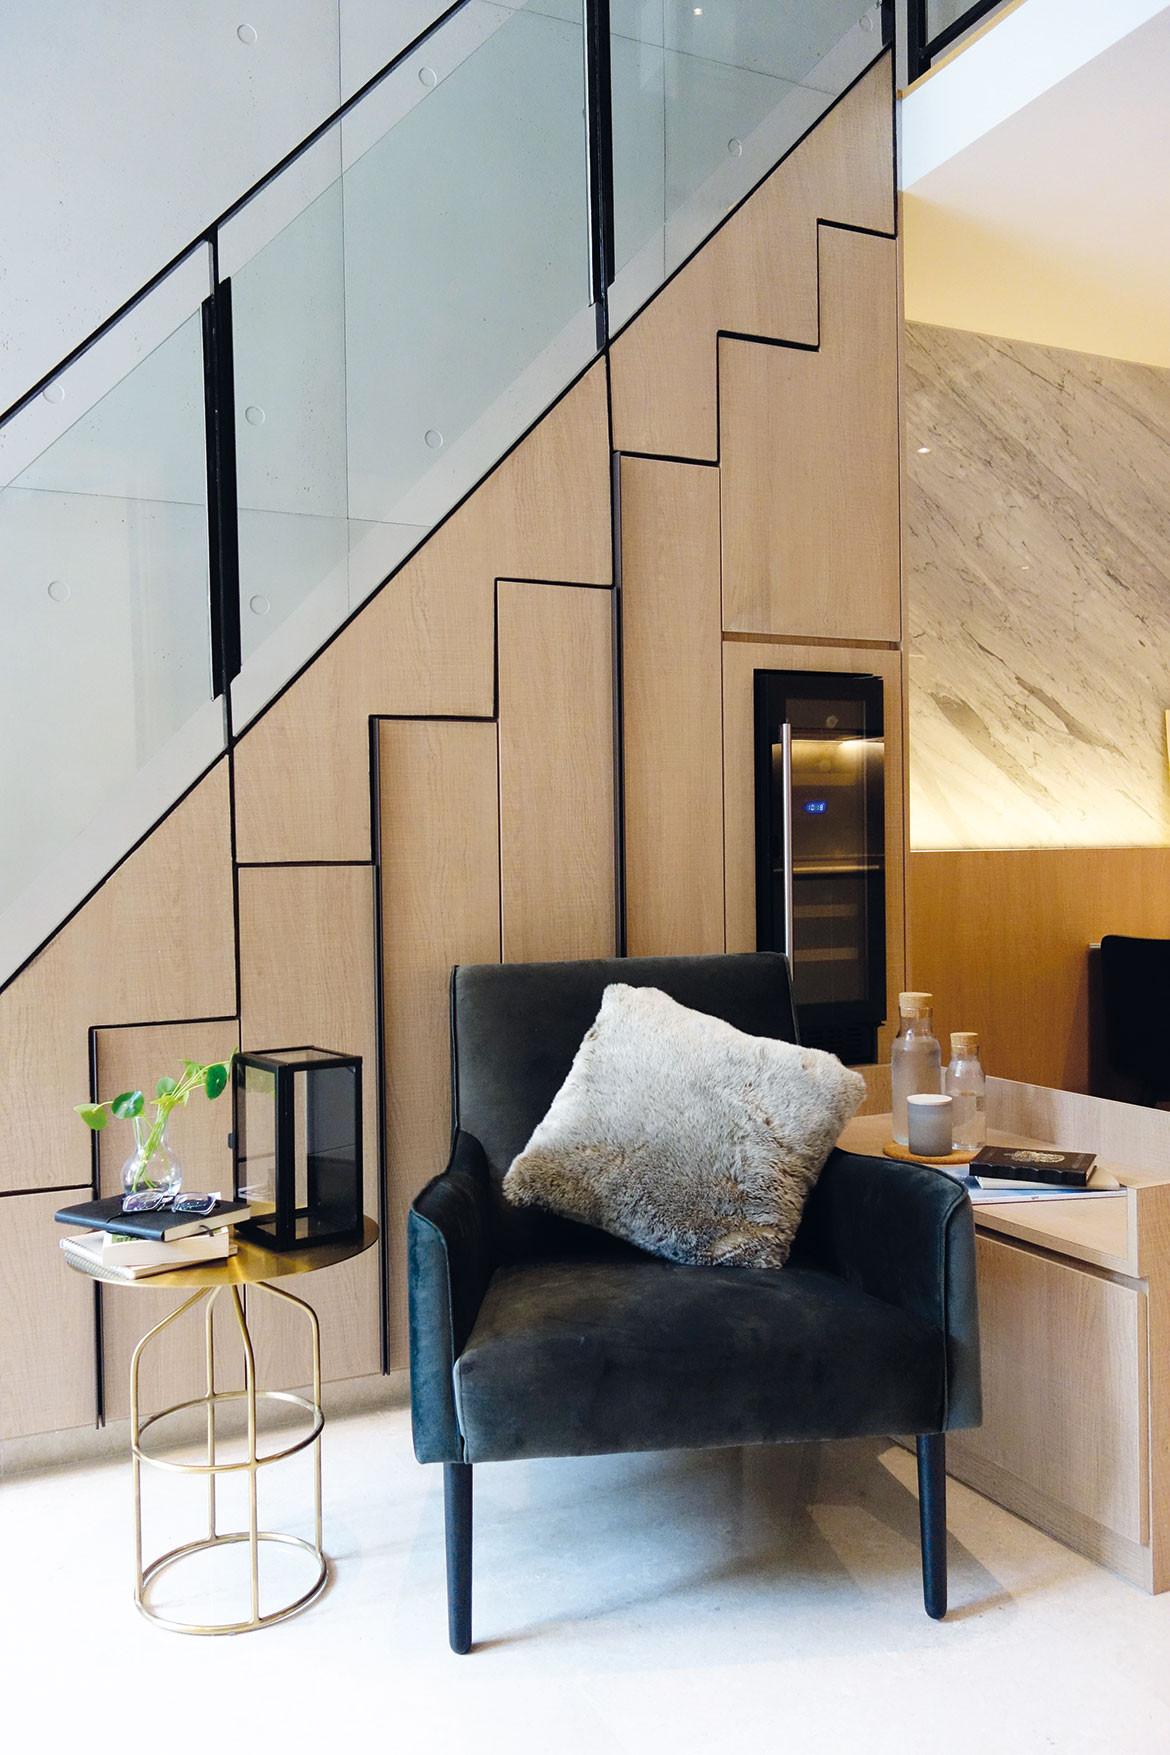 4 Great Loft Ideas Lookbox Living bachelor pad chair